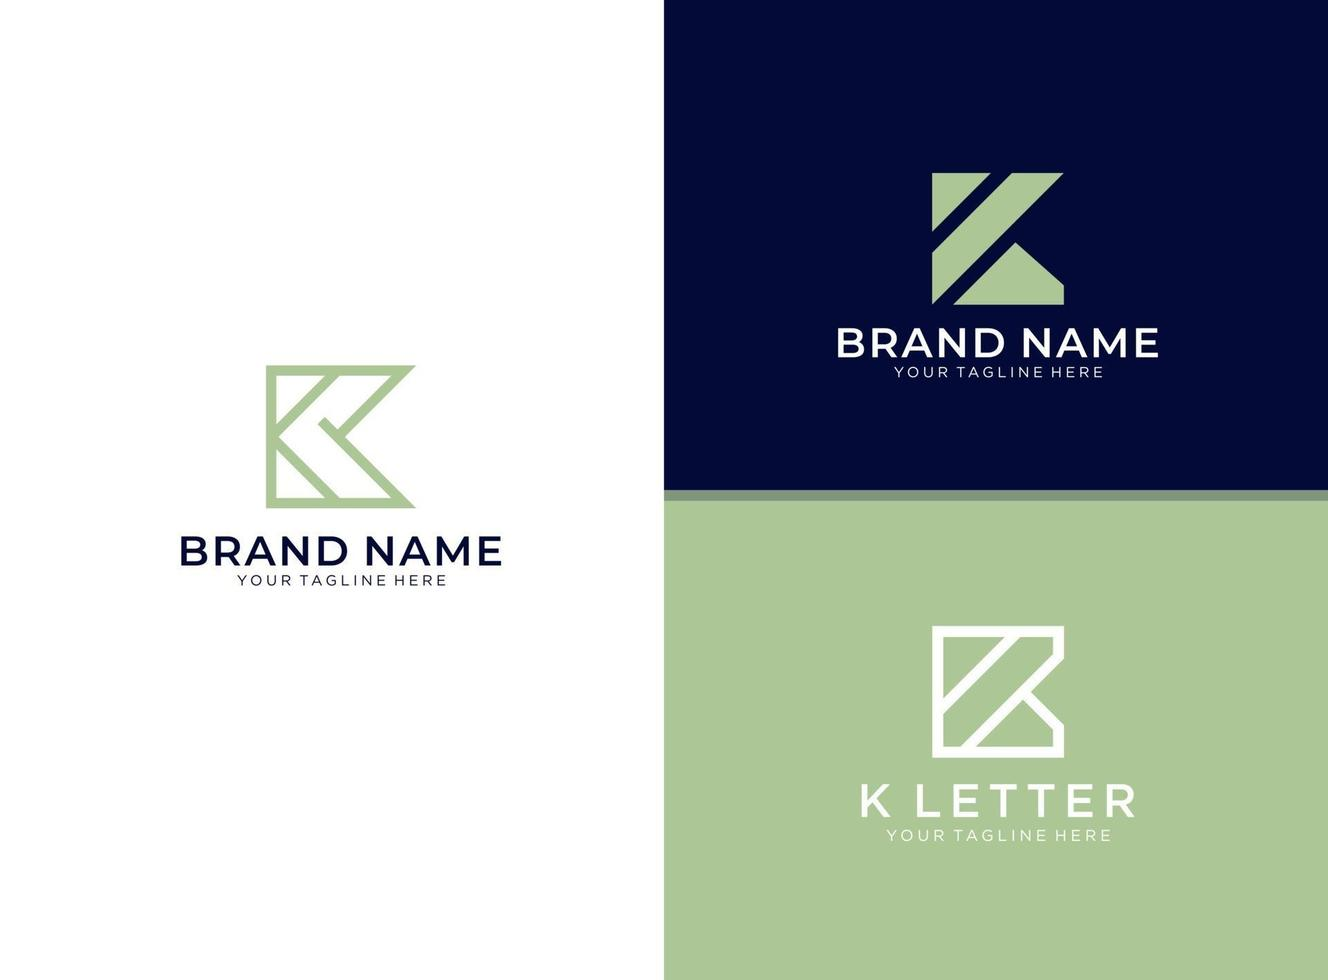 conjunto de modelo de logotipo k inititals simples e limpo vetor